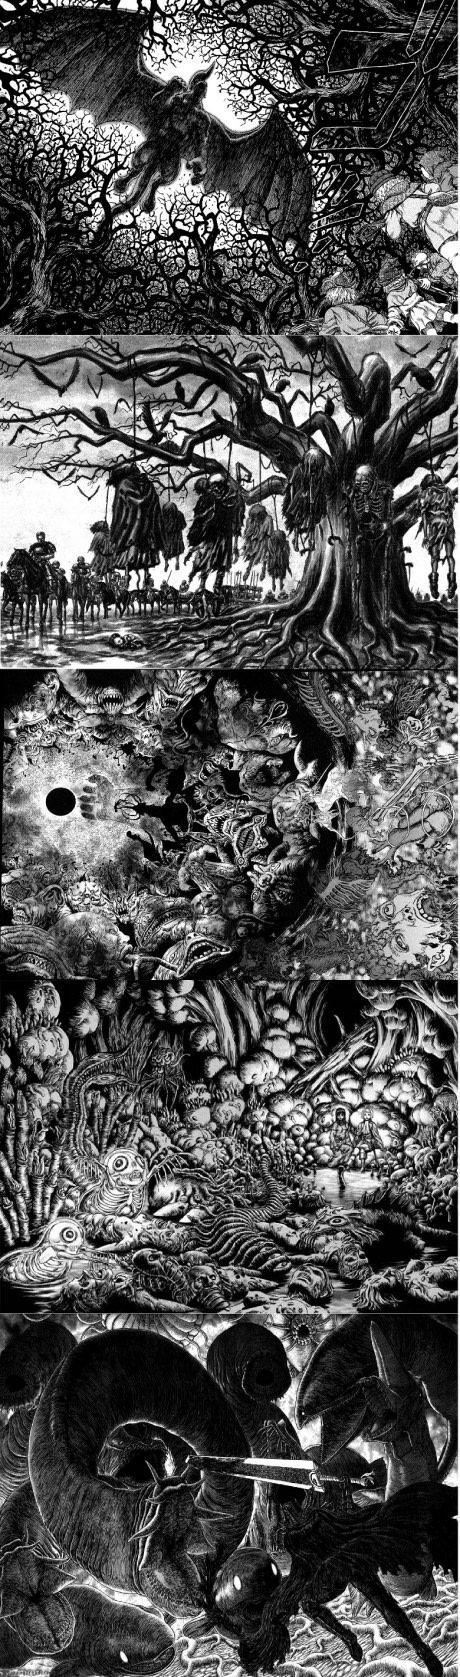 Artwork from Kentaro Miura for Berserk. Simply beautiful.